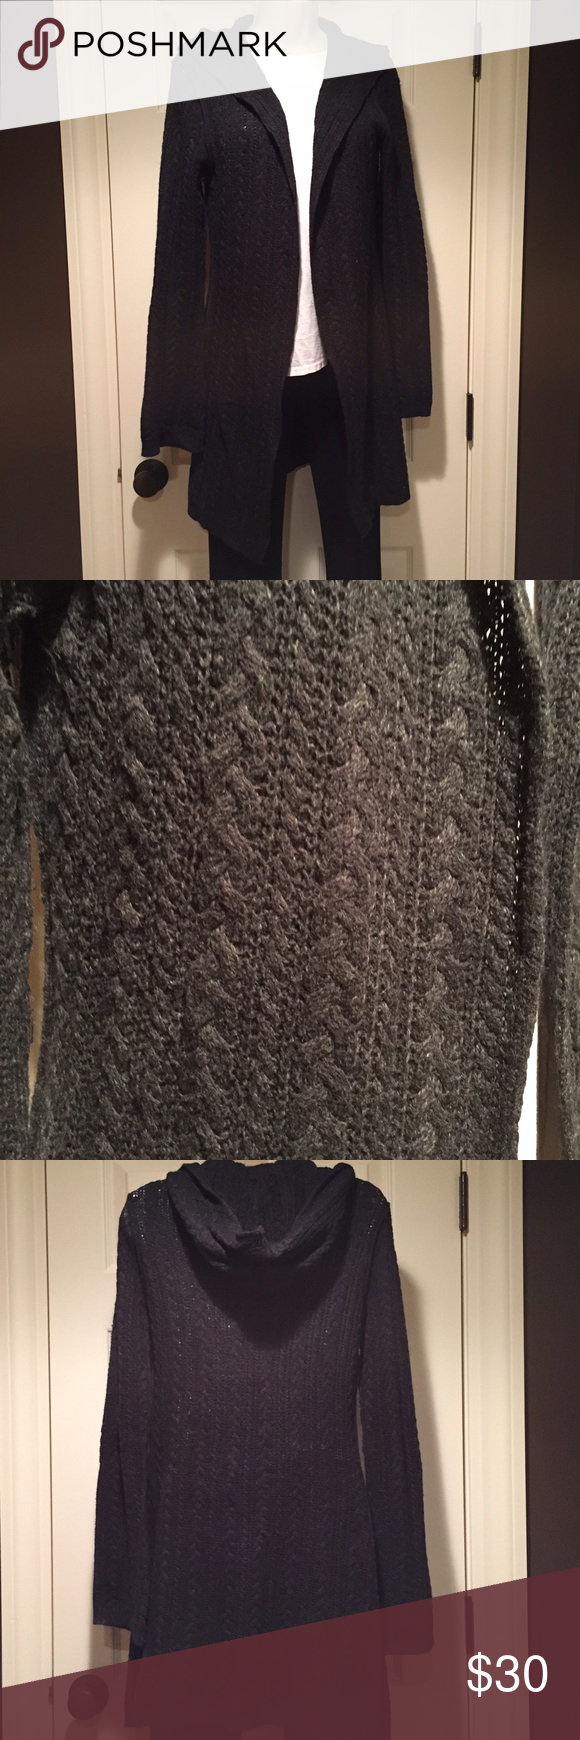 CAbi black cable knit sweater, S CAbi black cable knit sweater, S CAbi Sweaters Cardigans